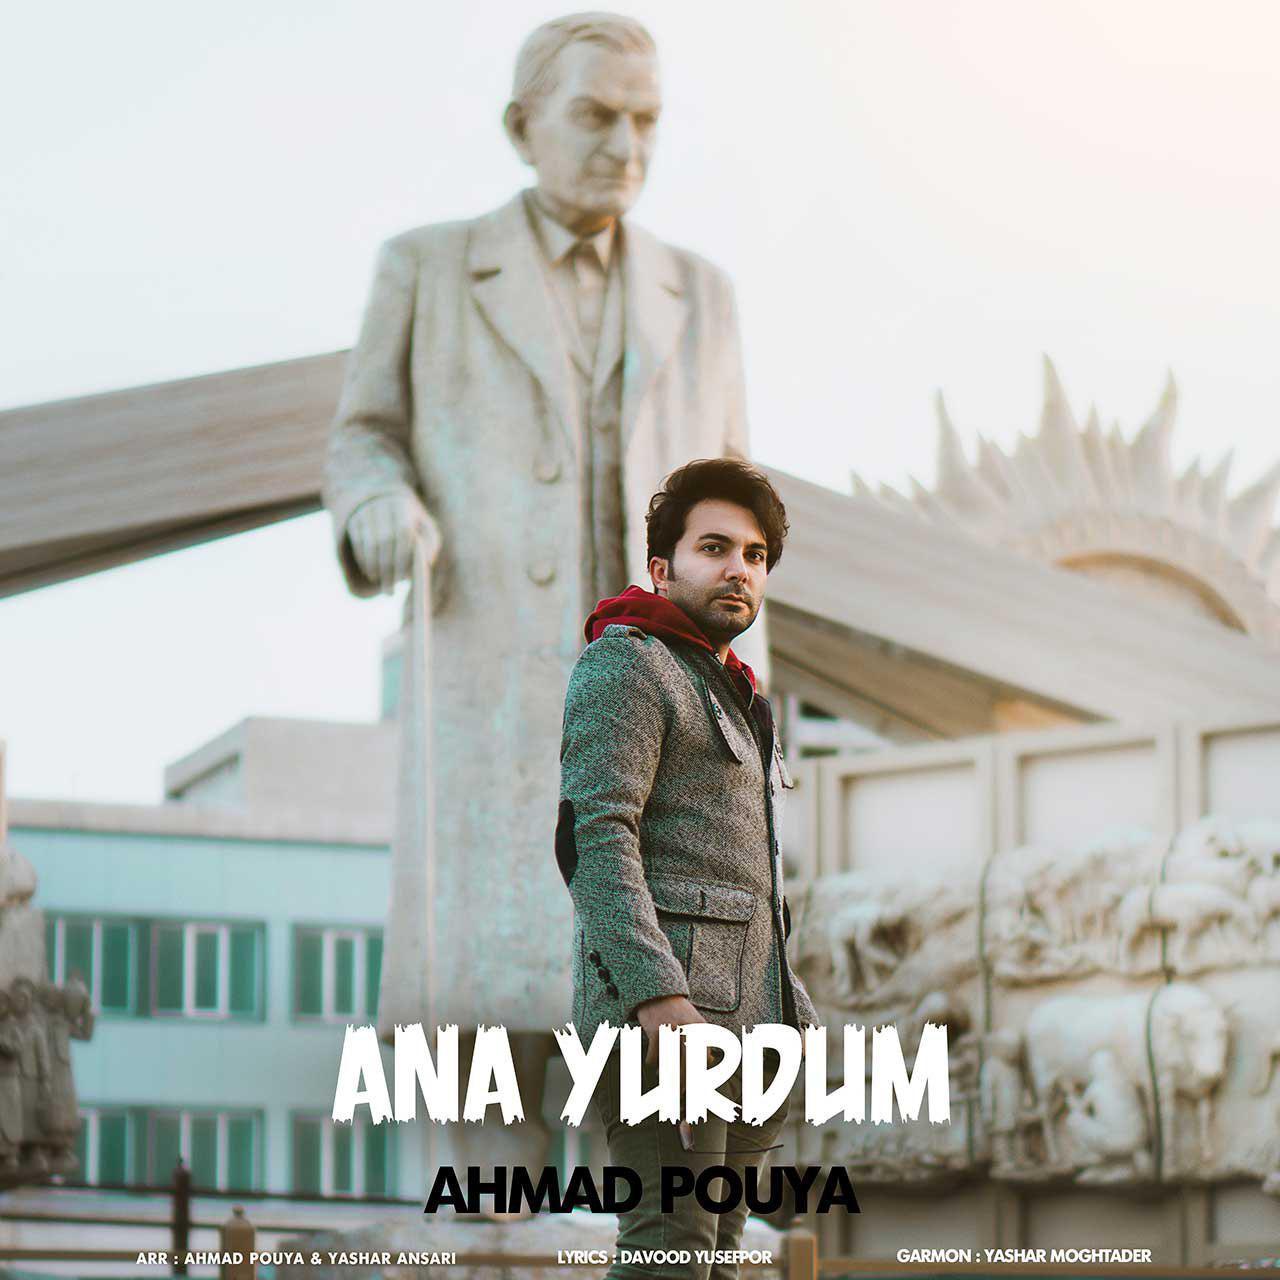 http://s8.picofile.com/file/8360450268/04Ahmad_Pouya_Ana_Yurdum.jpg